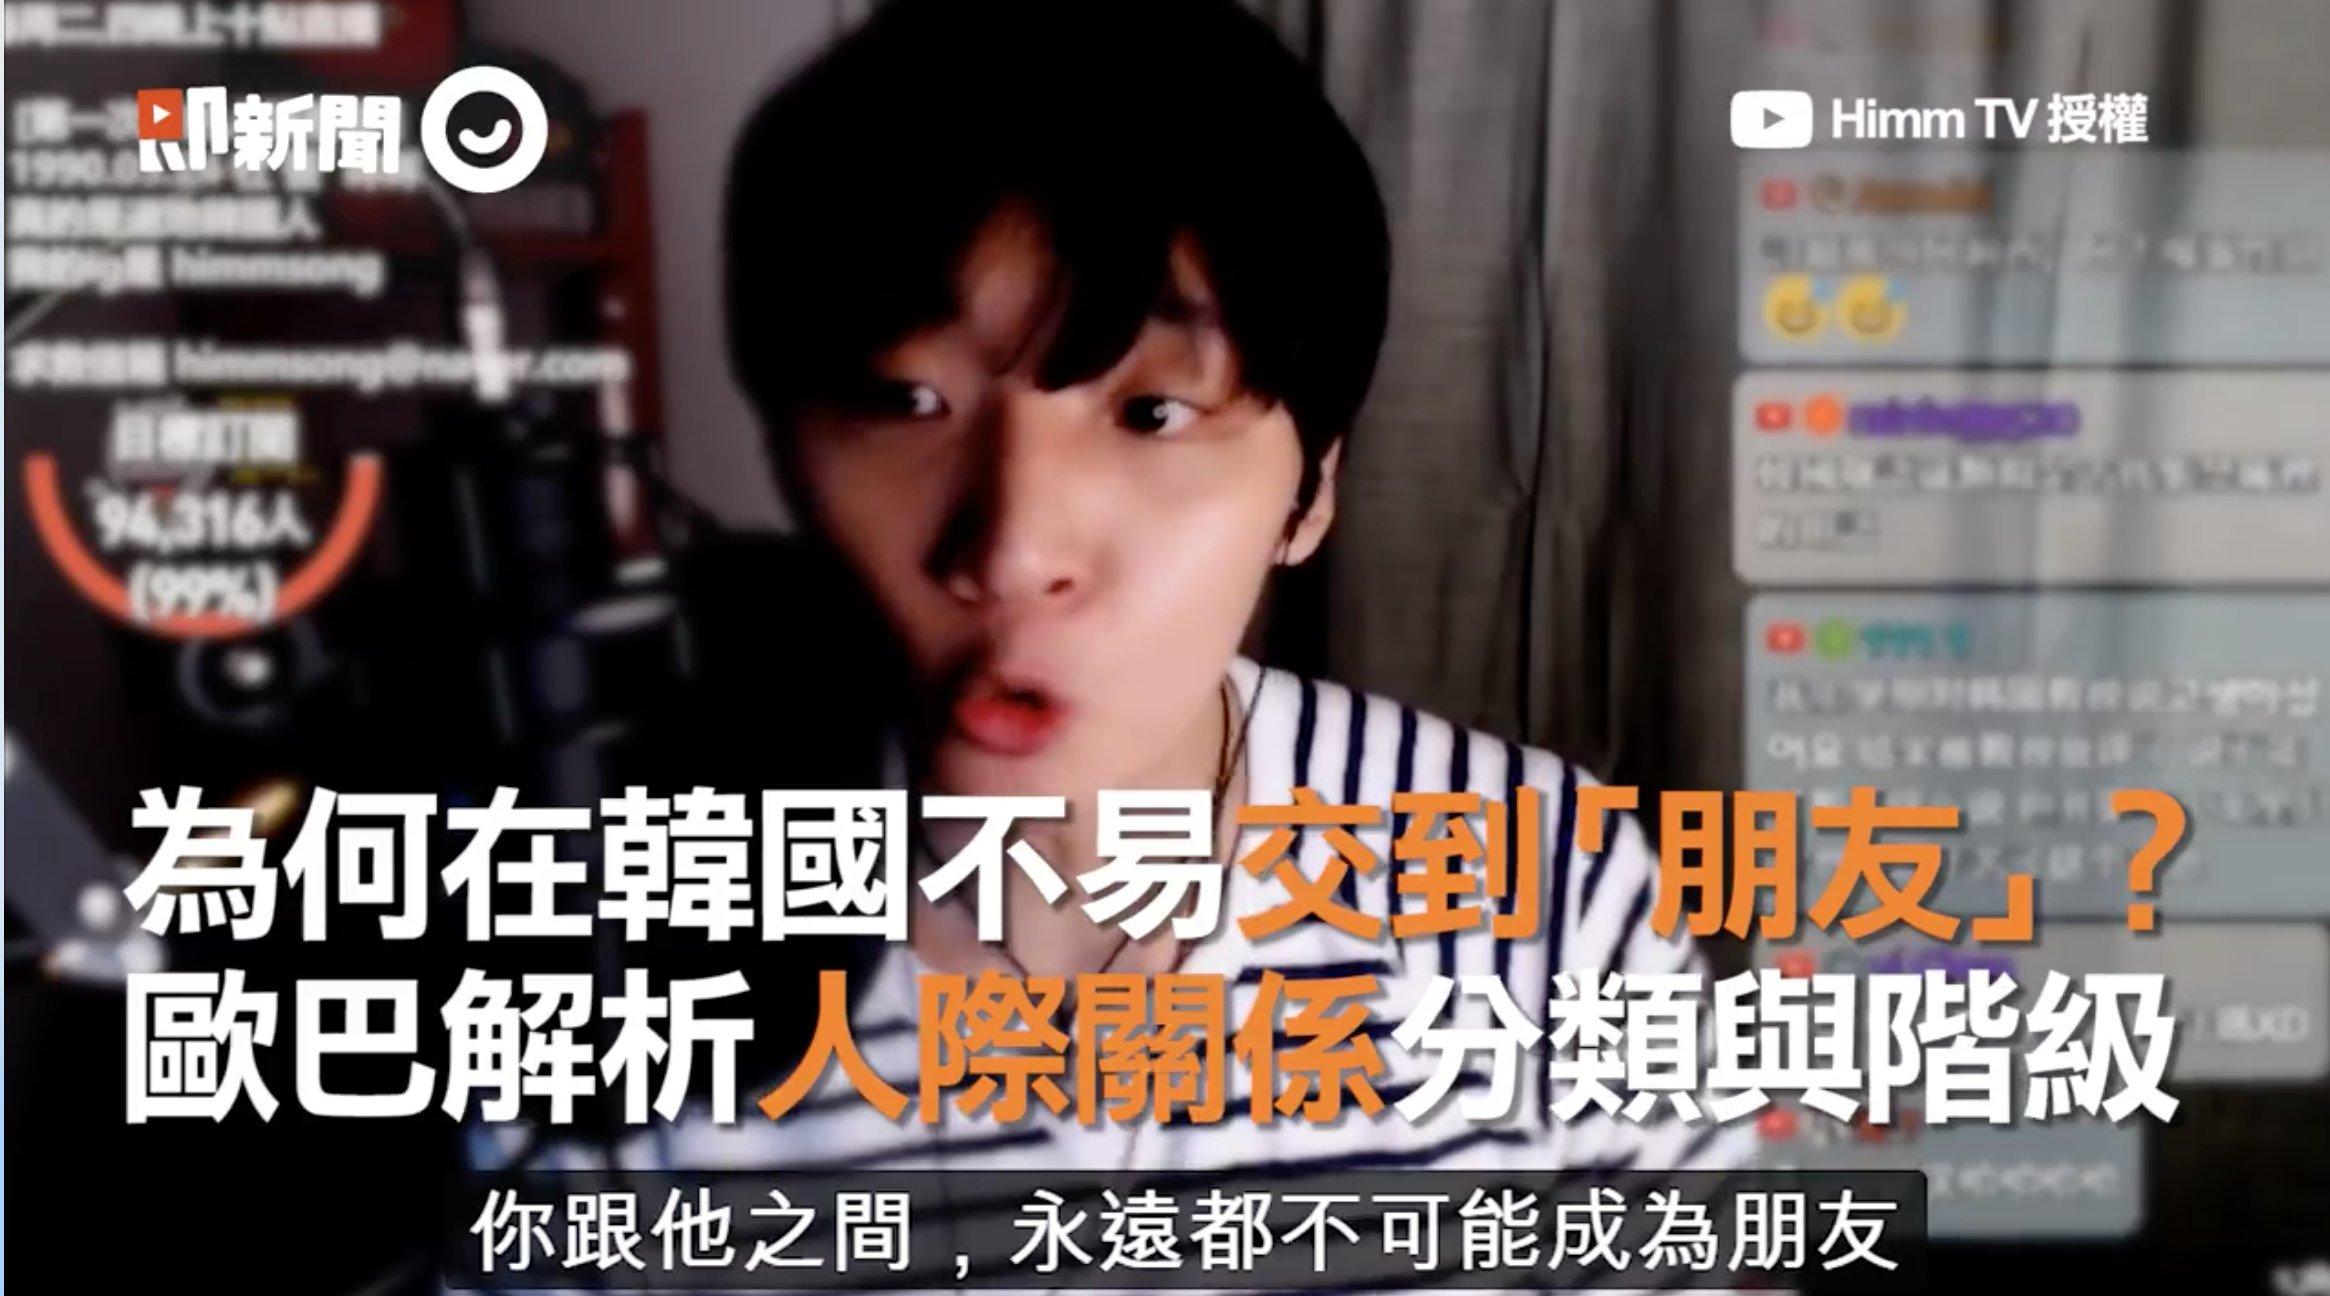 screen shot 2018 10 03 at 4 40 19 pm.png?resize=300,169 - 為何在韓國不易交到「朋友」? 歐爸解析韓國人際生態:「一句話定生死!」